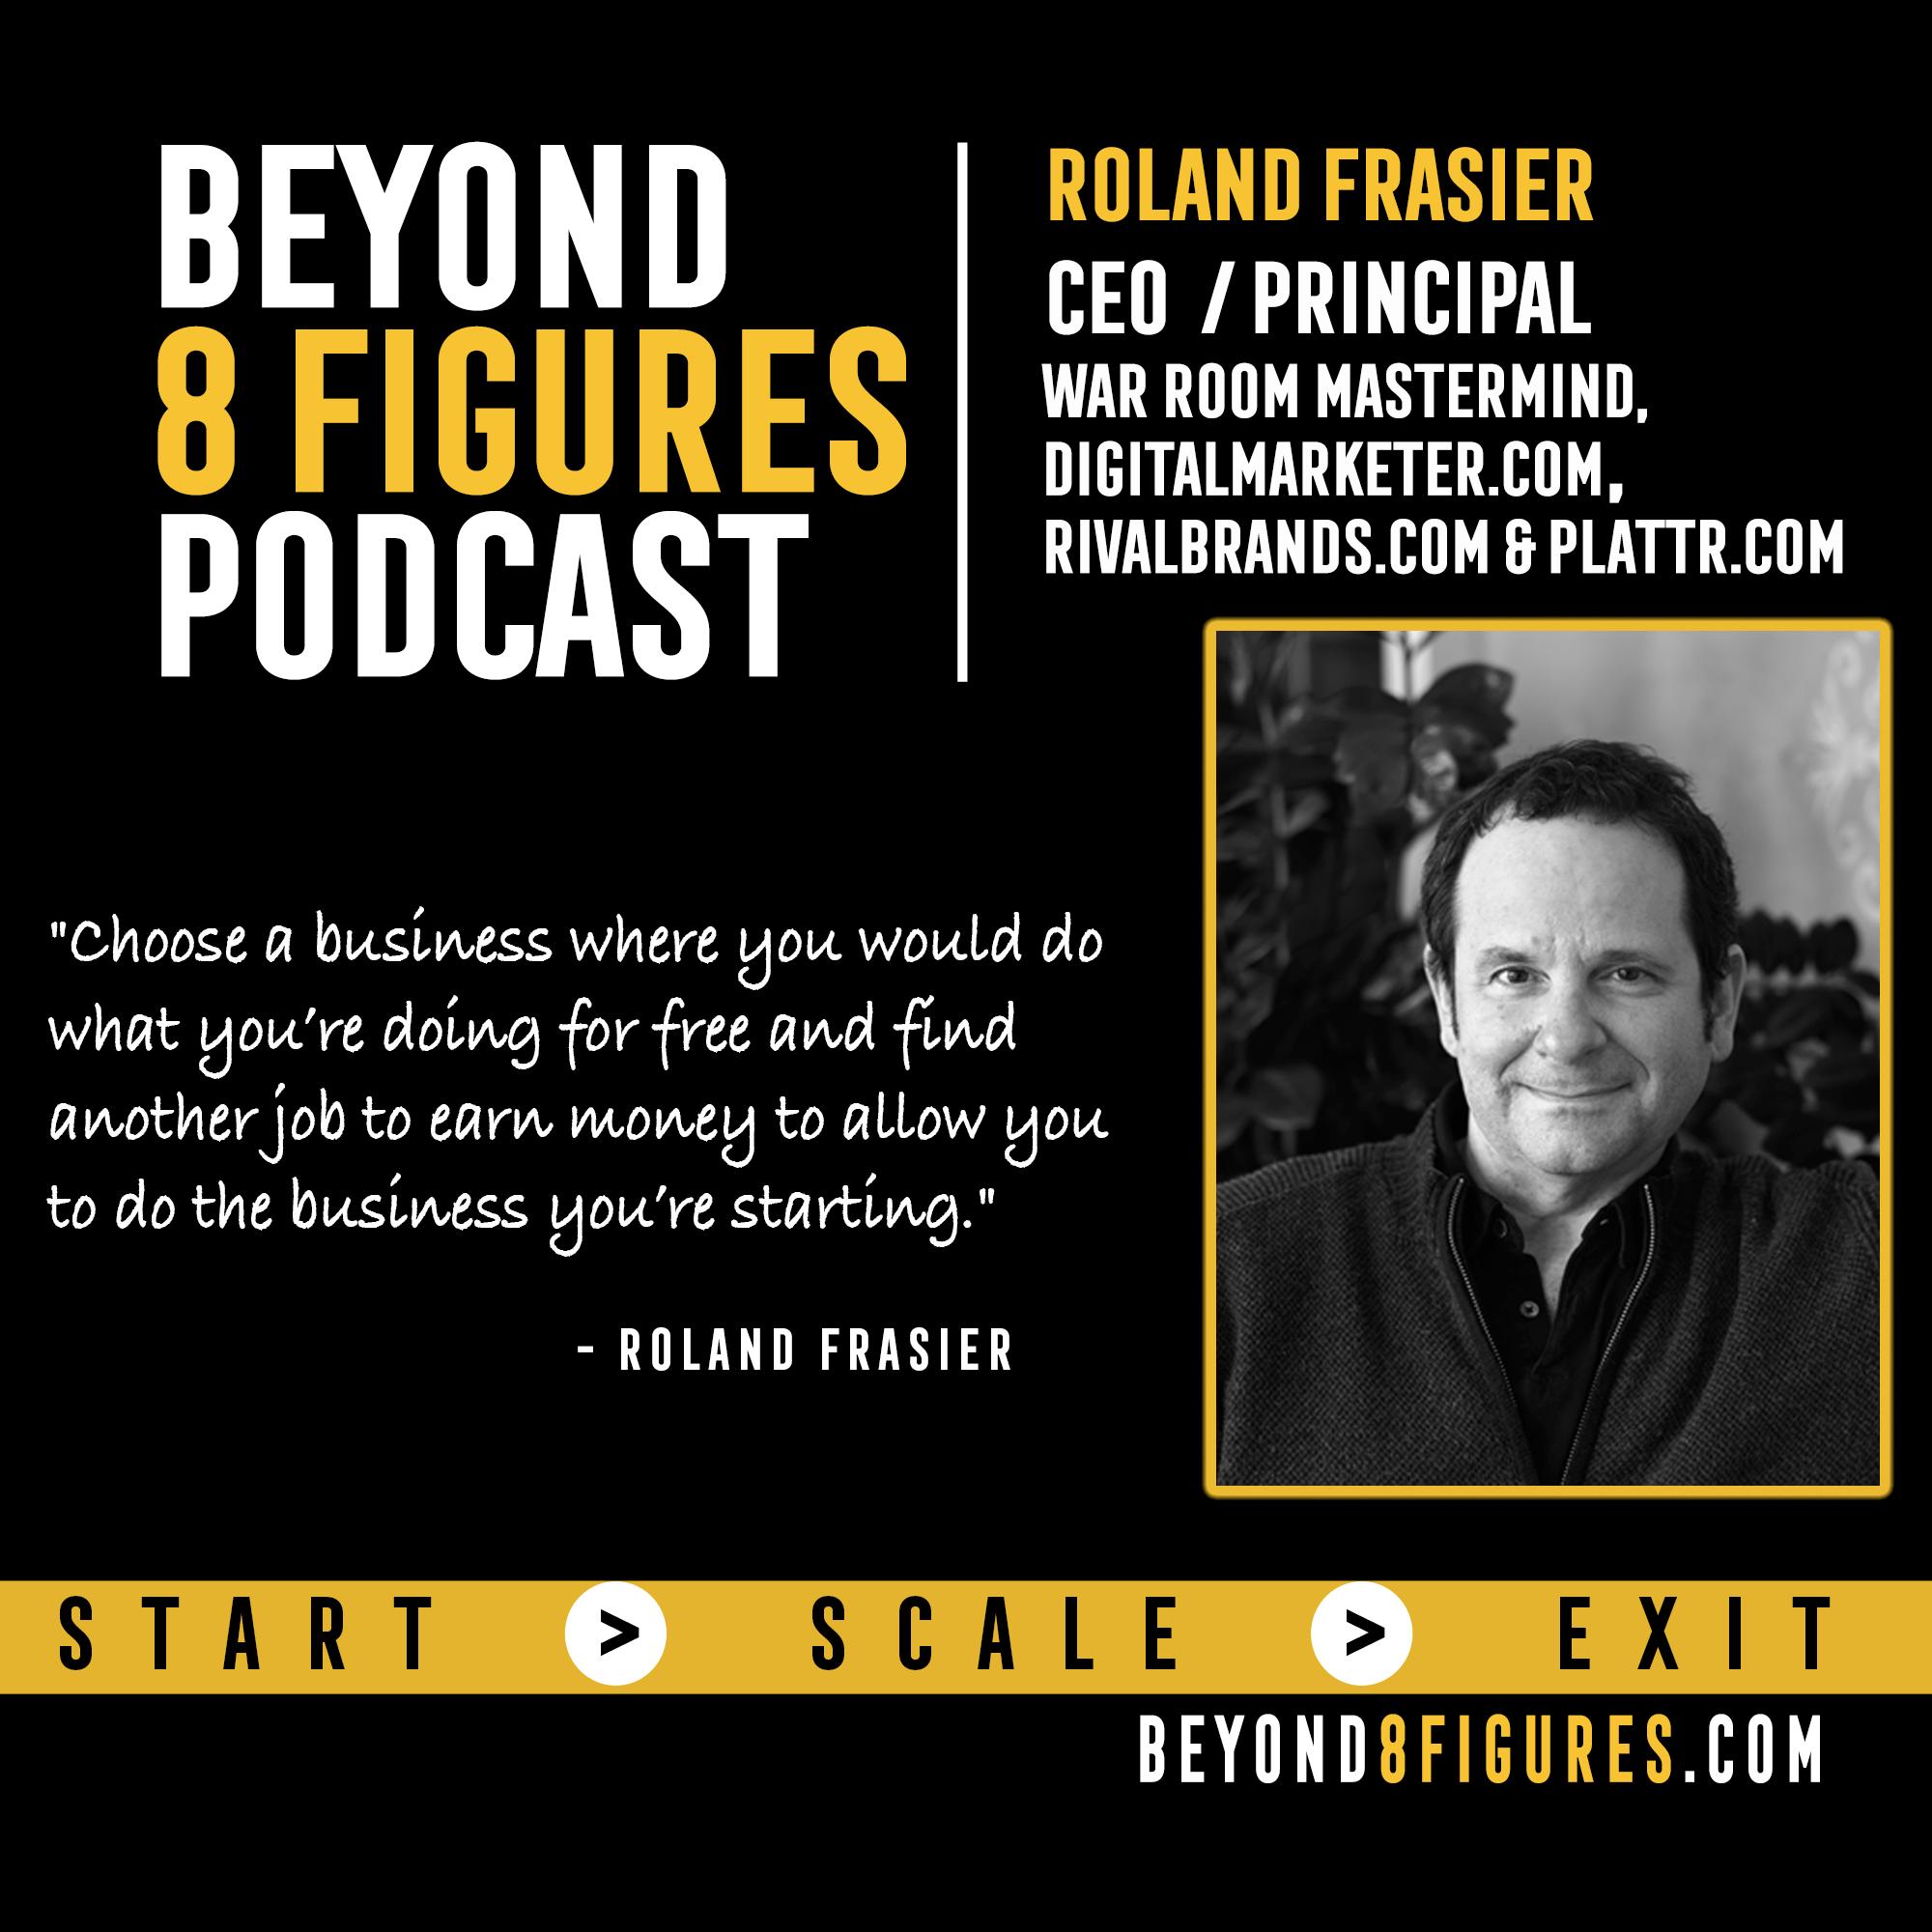 Roland Frasier on Beyond 8 Figures Podcast